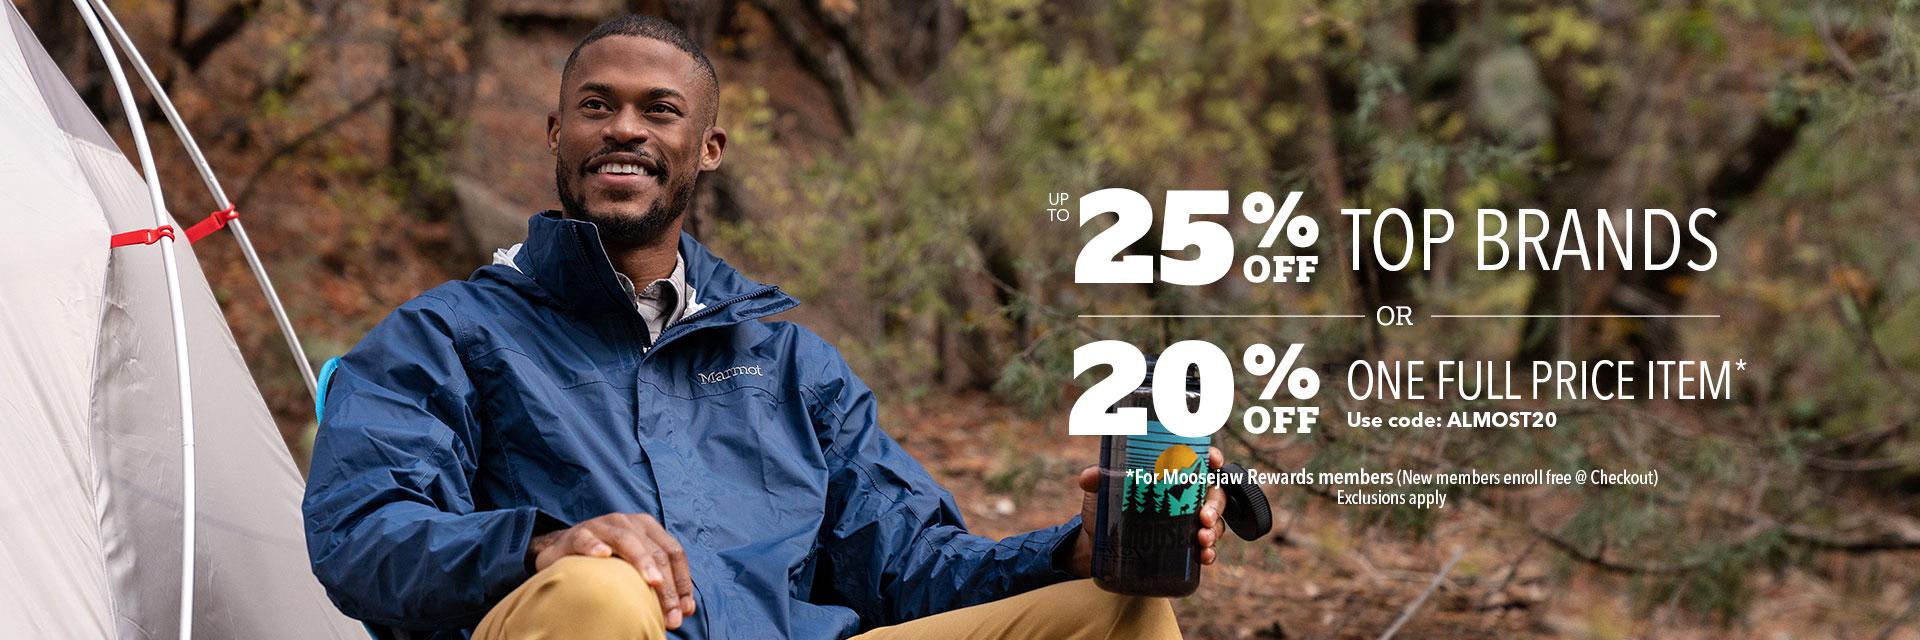 Moosejaw全價商品立折20%優惠券,Moosejaw精選戶外裝備和外套8折優惠碼